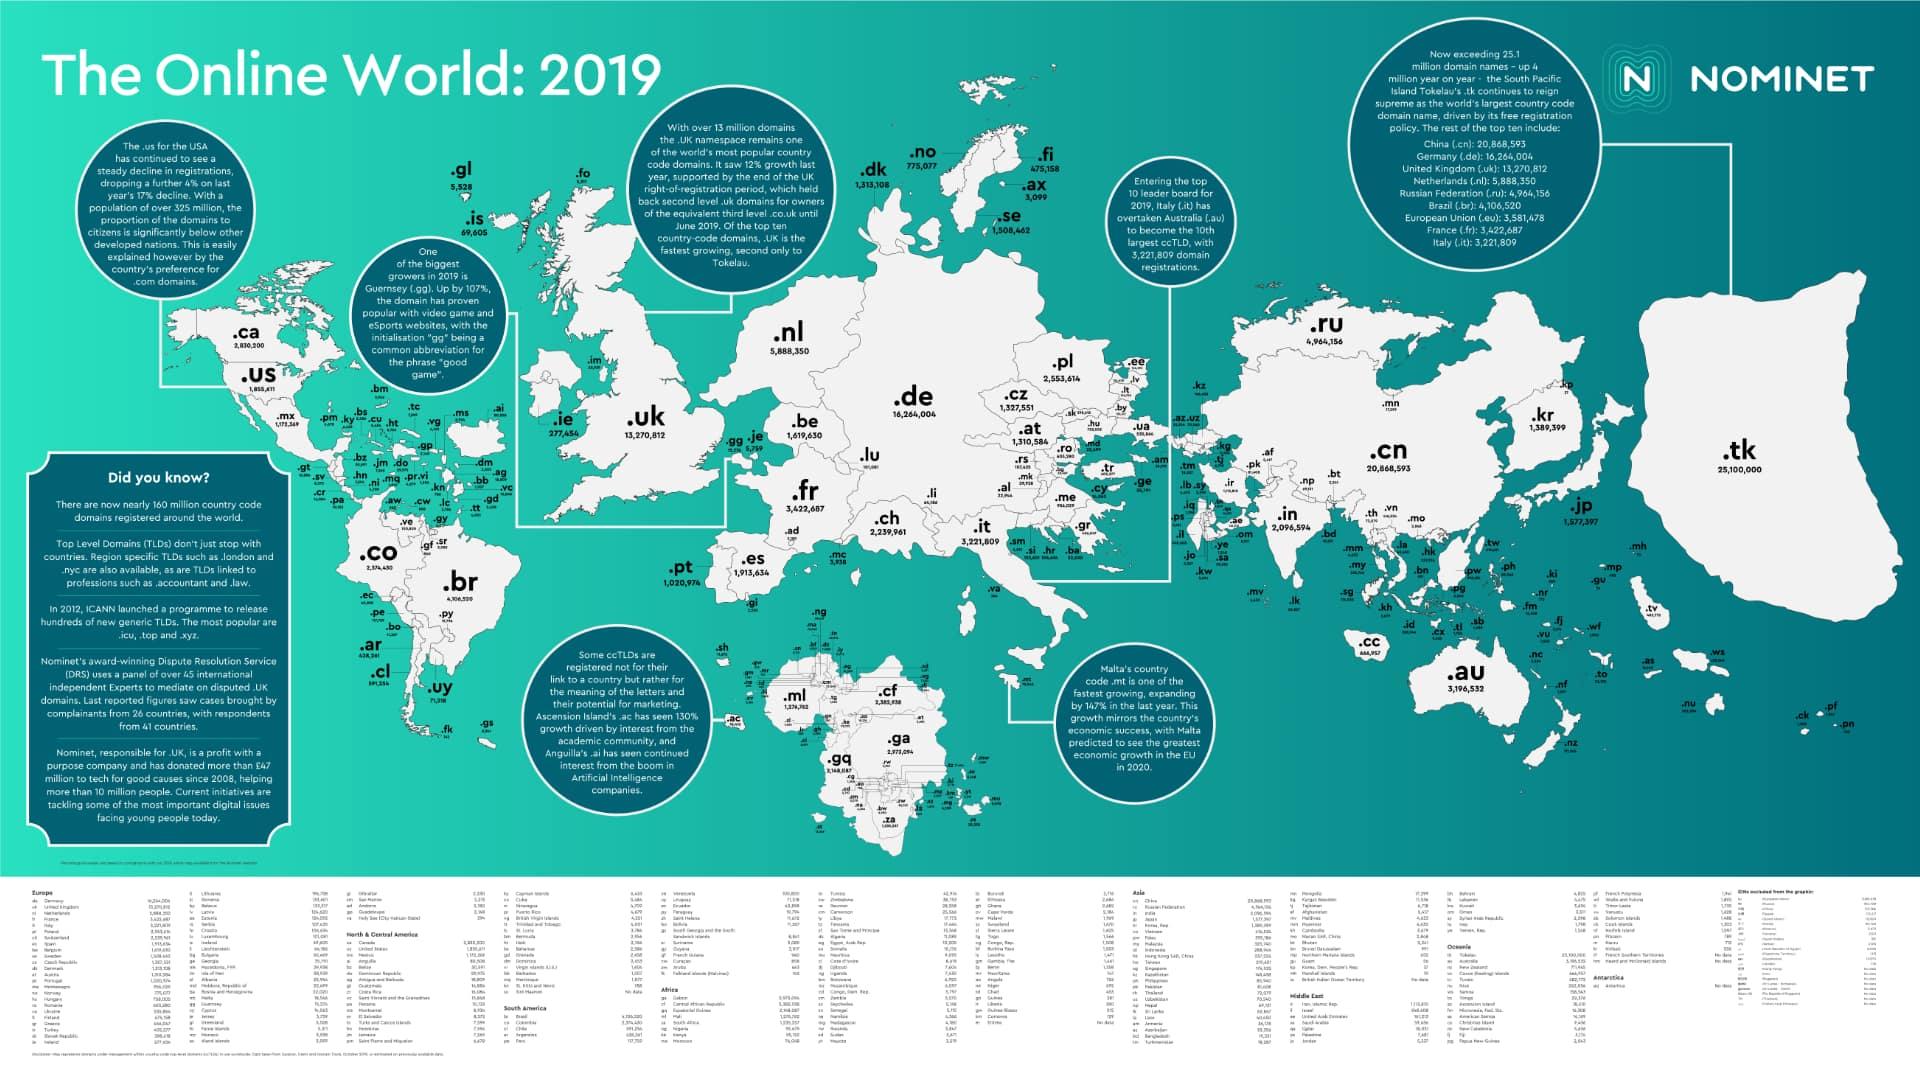 2019 ccTLD map